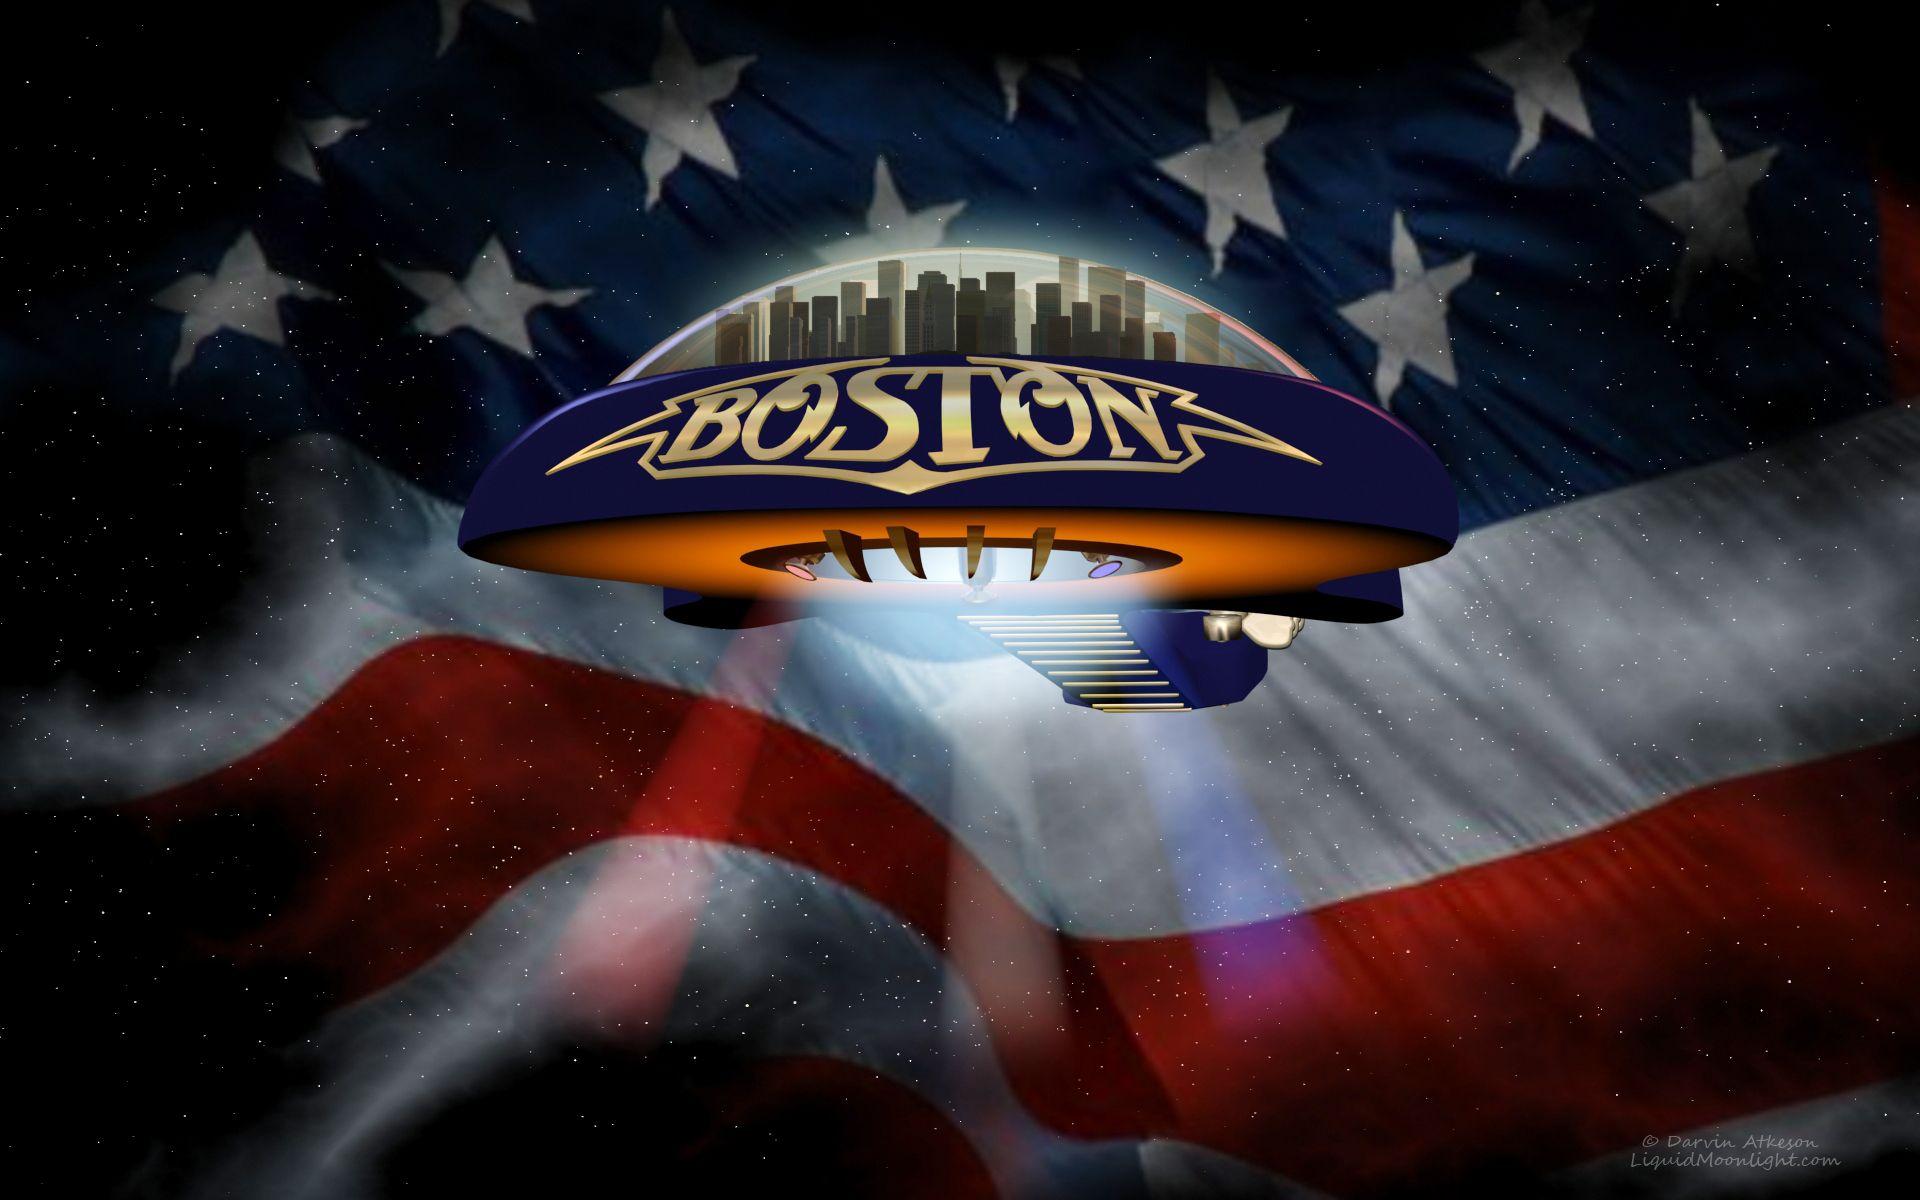 Music Boston An American Rock Roll Band desktop wallpaper nr 1920x1200